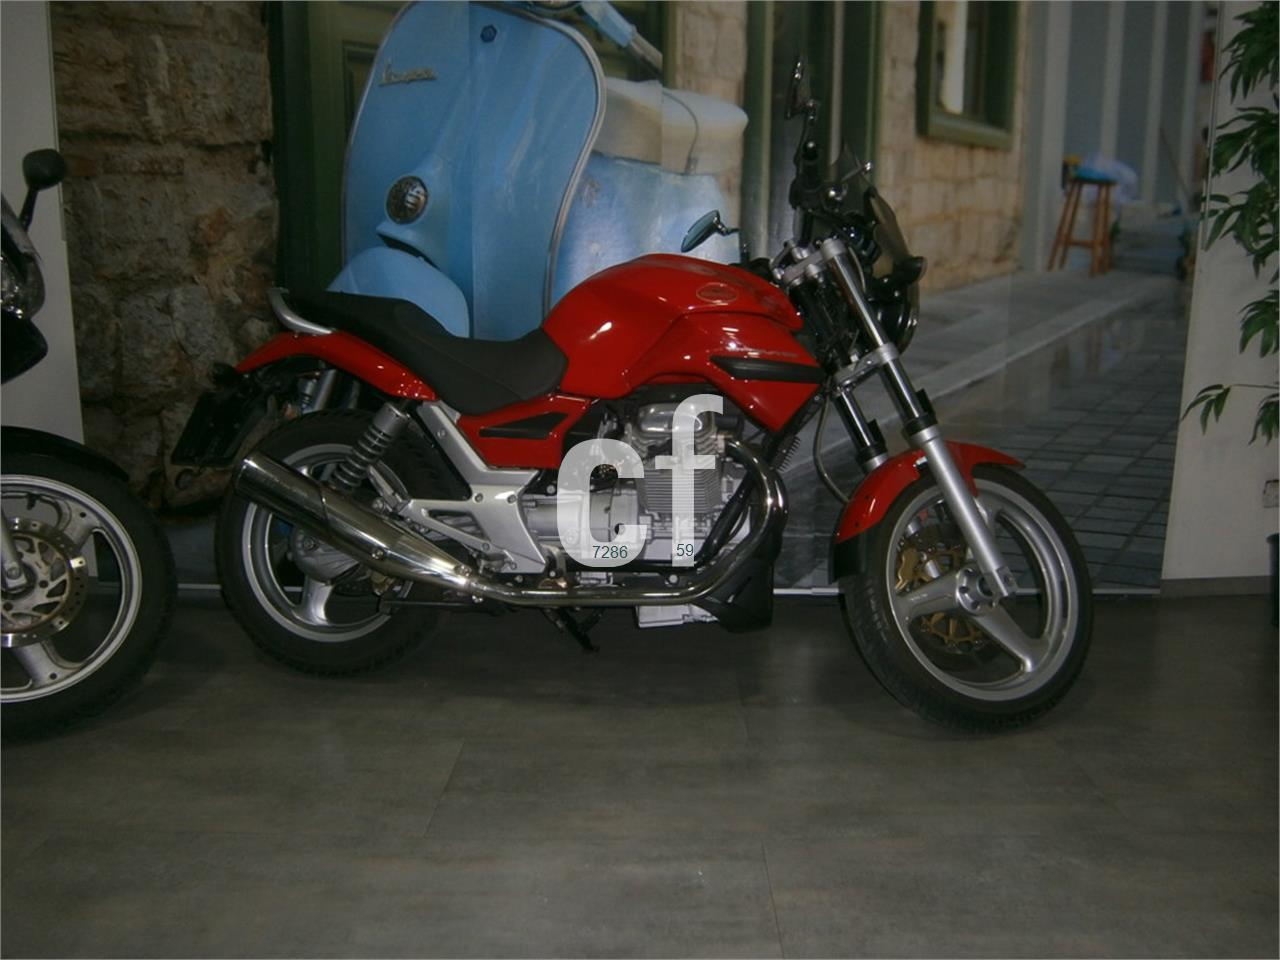 MOTO GUZZI Breva 750 de venta